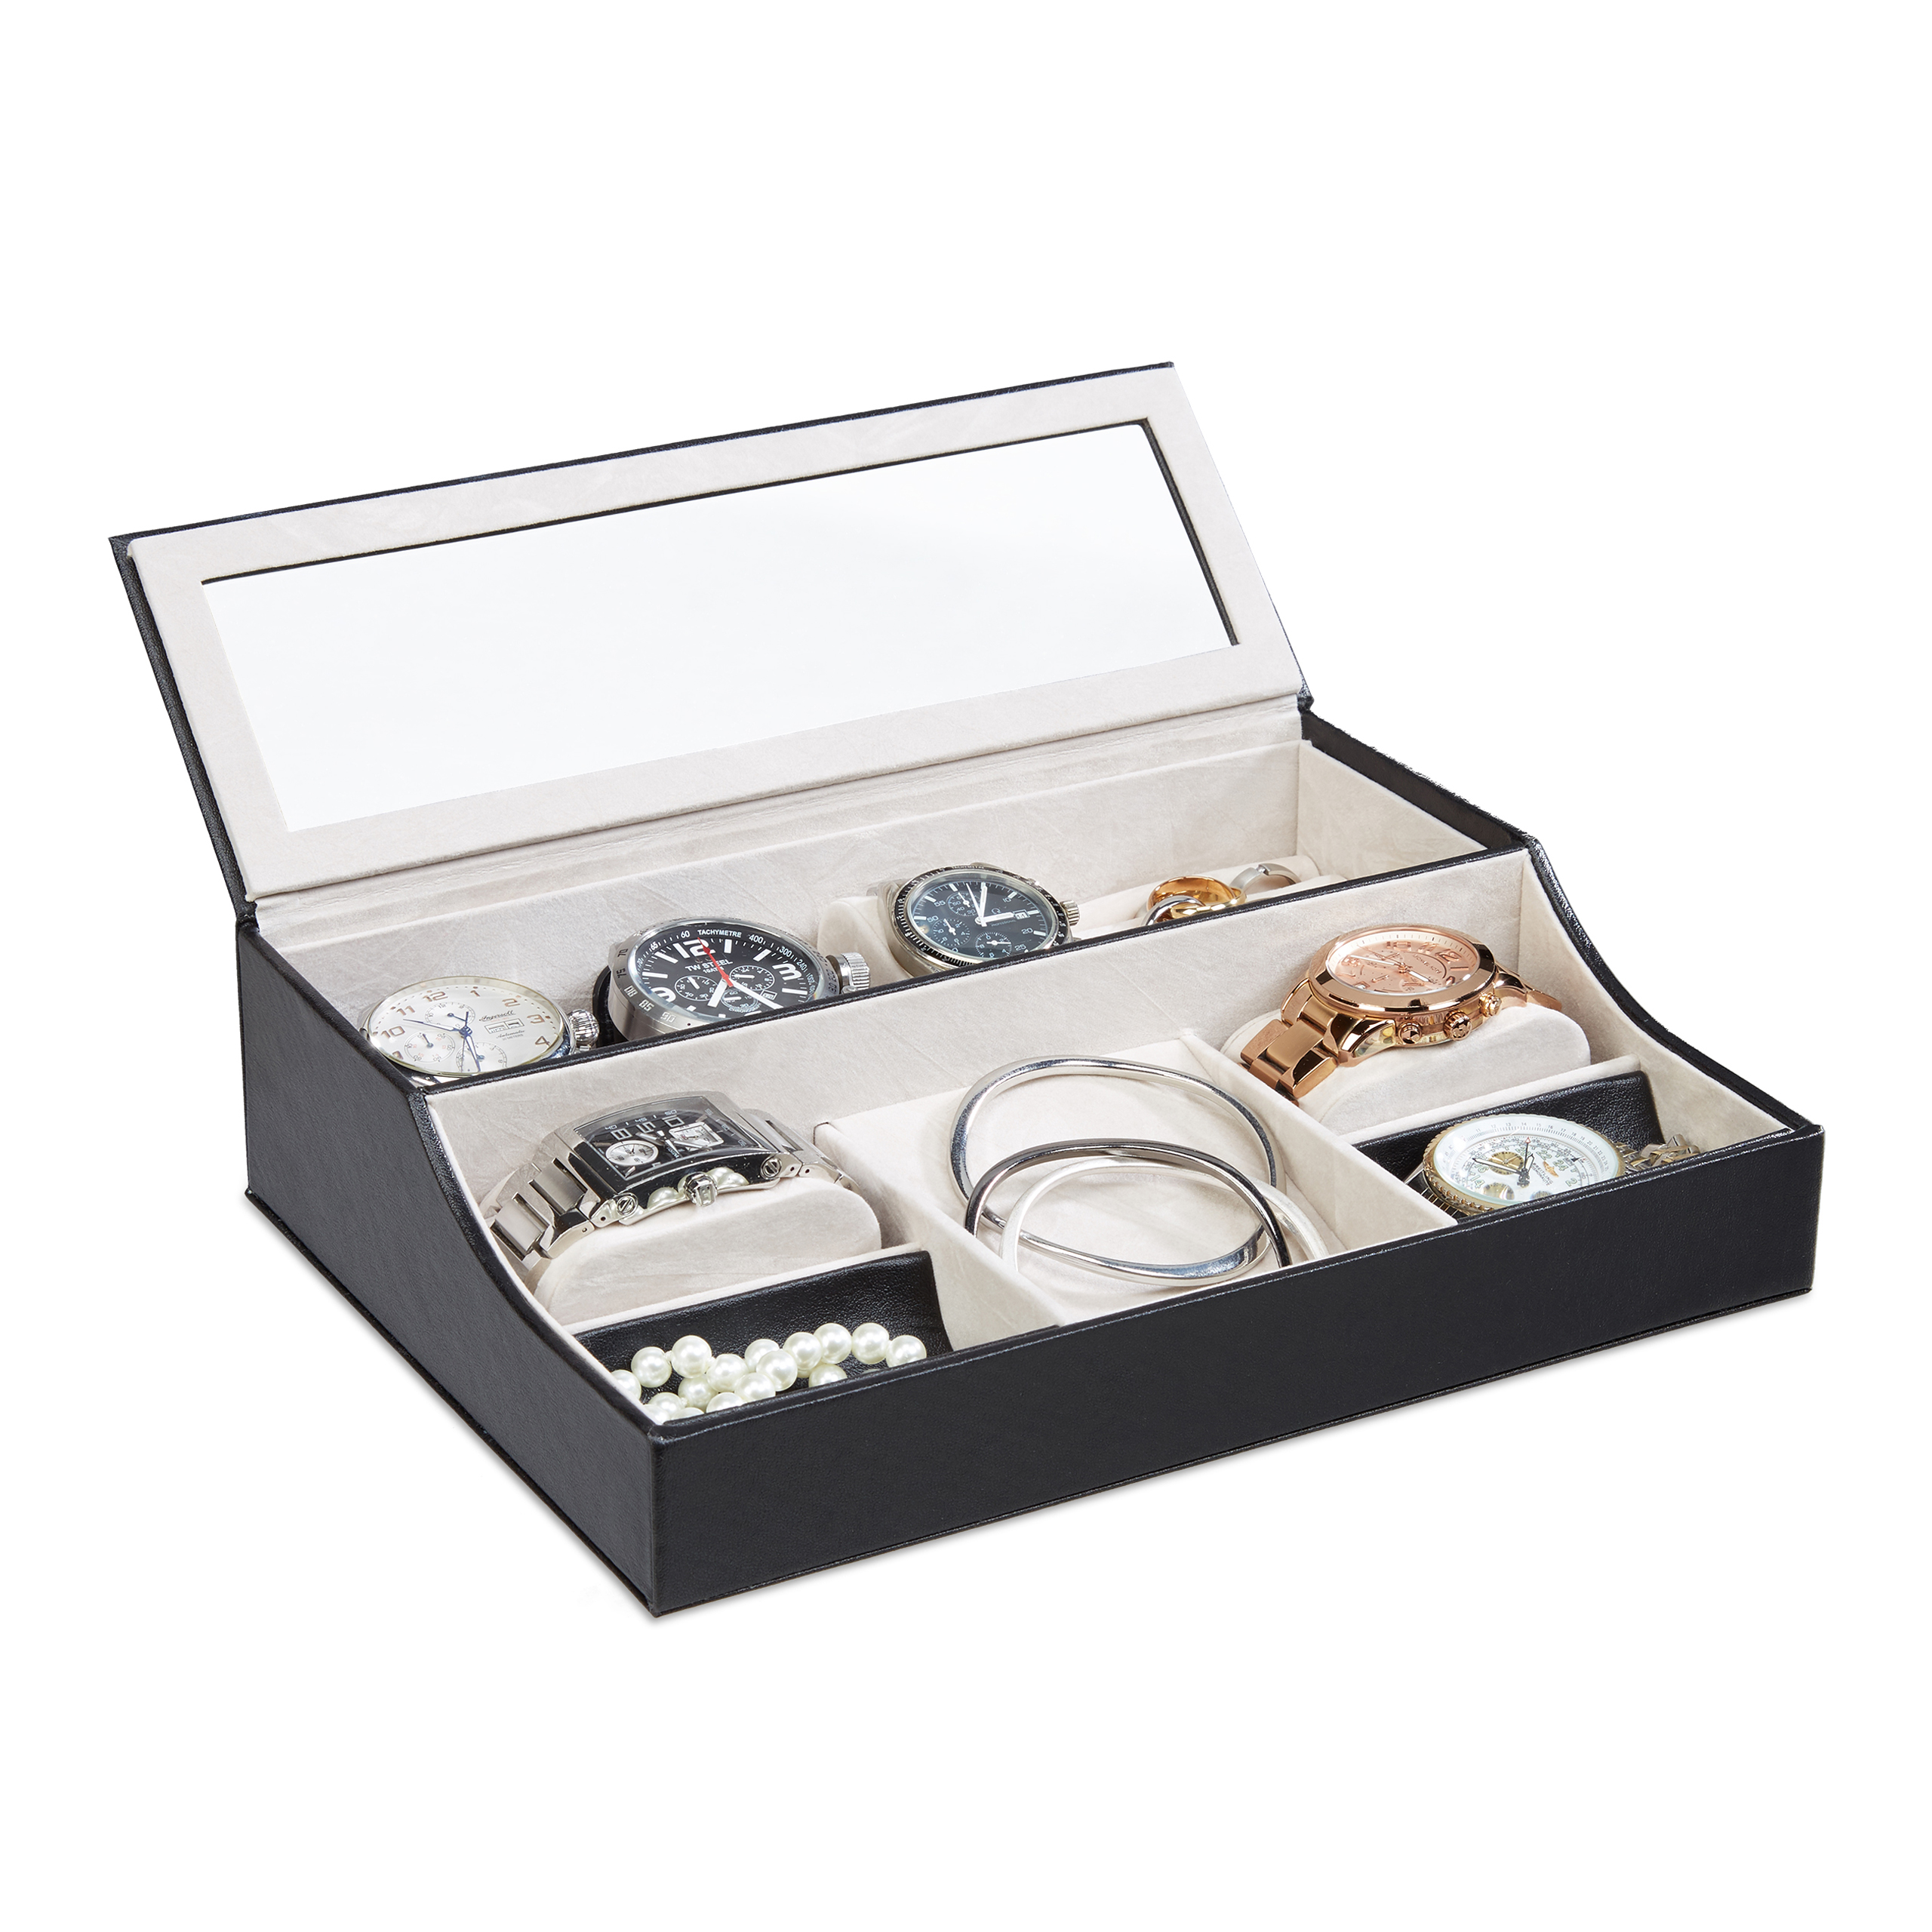 Small-Velvet-Jewellery-Box-Jewelry-Chest-Watch-Display-Case